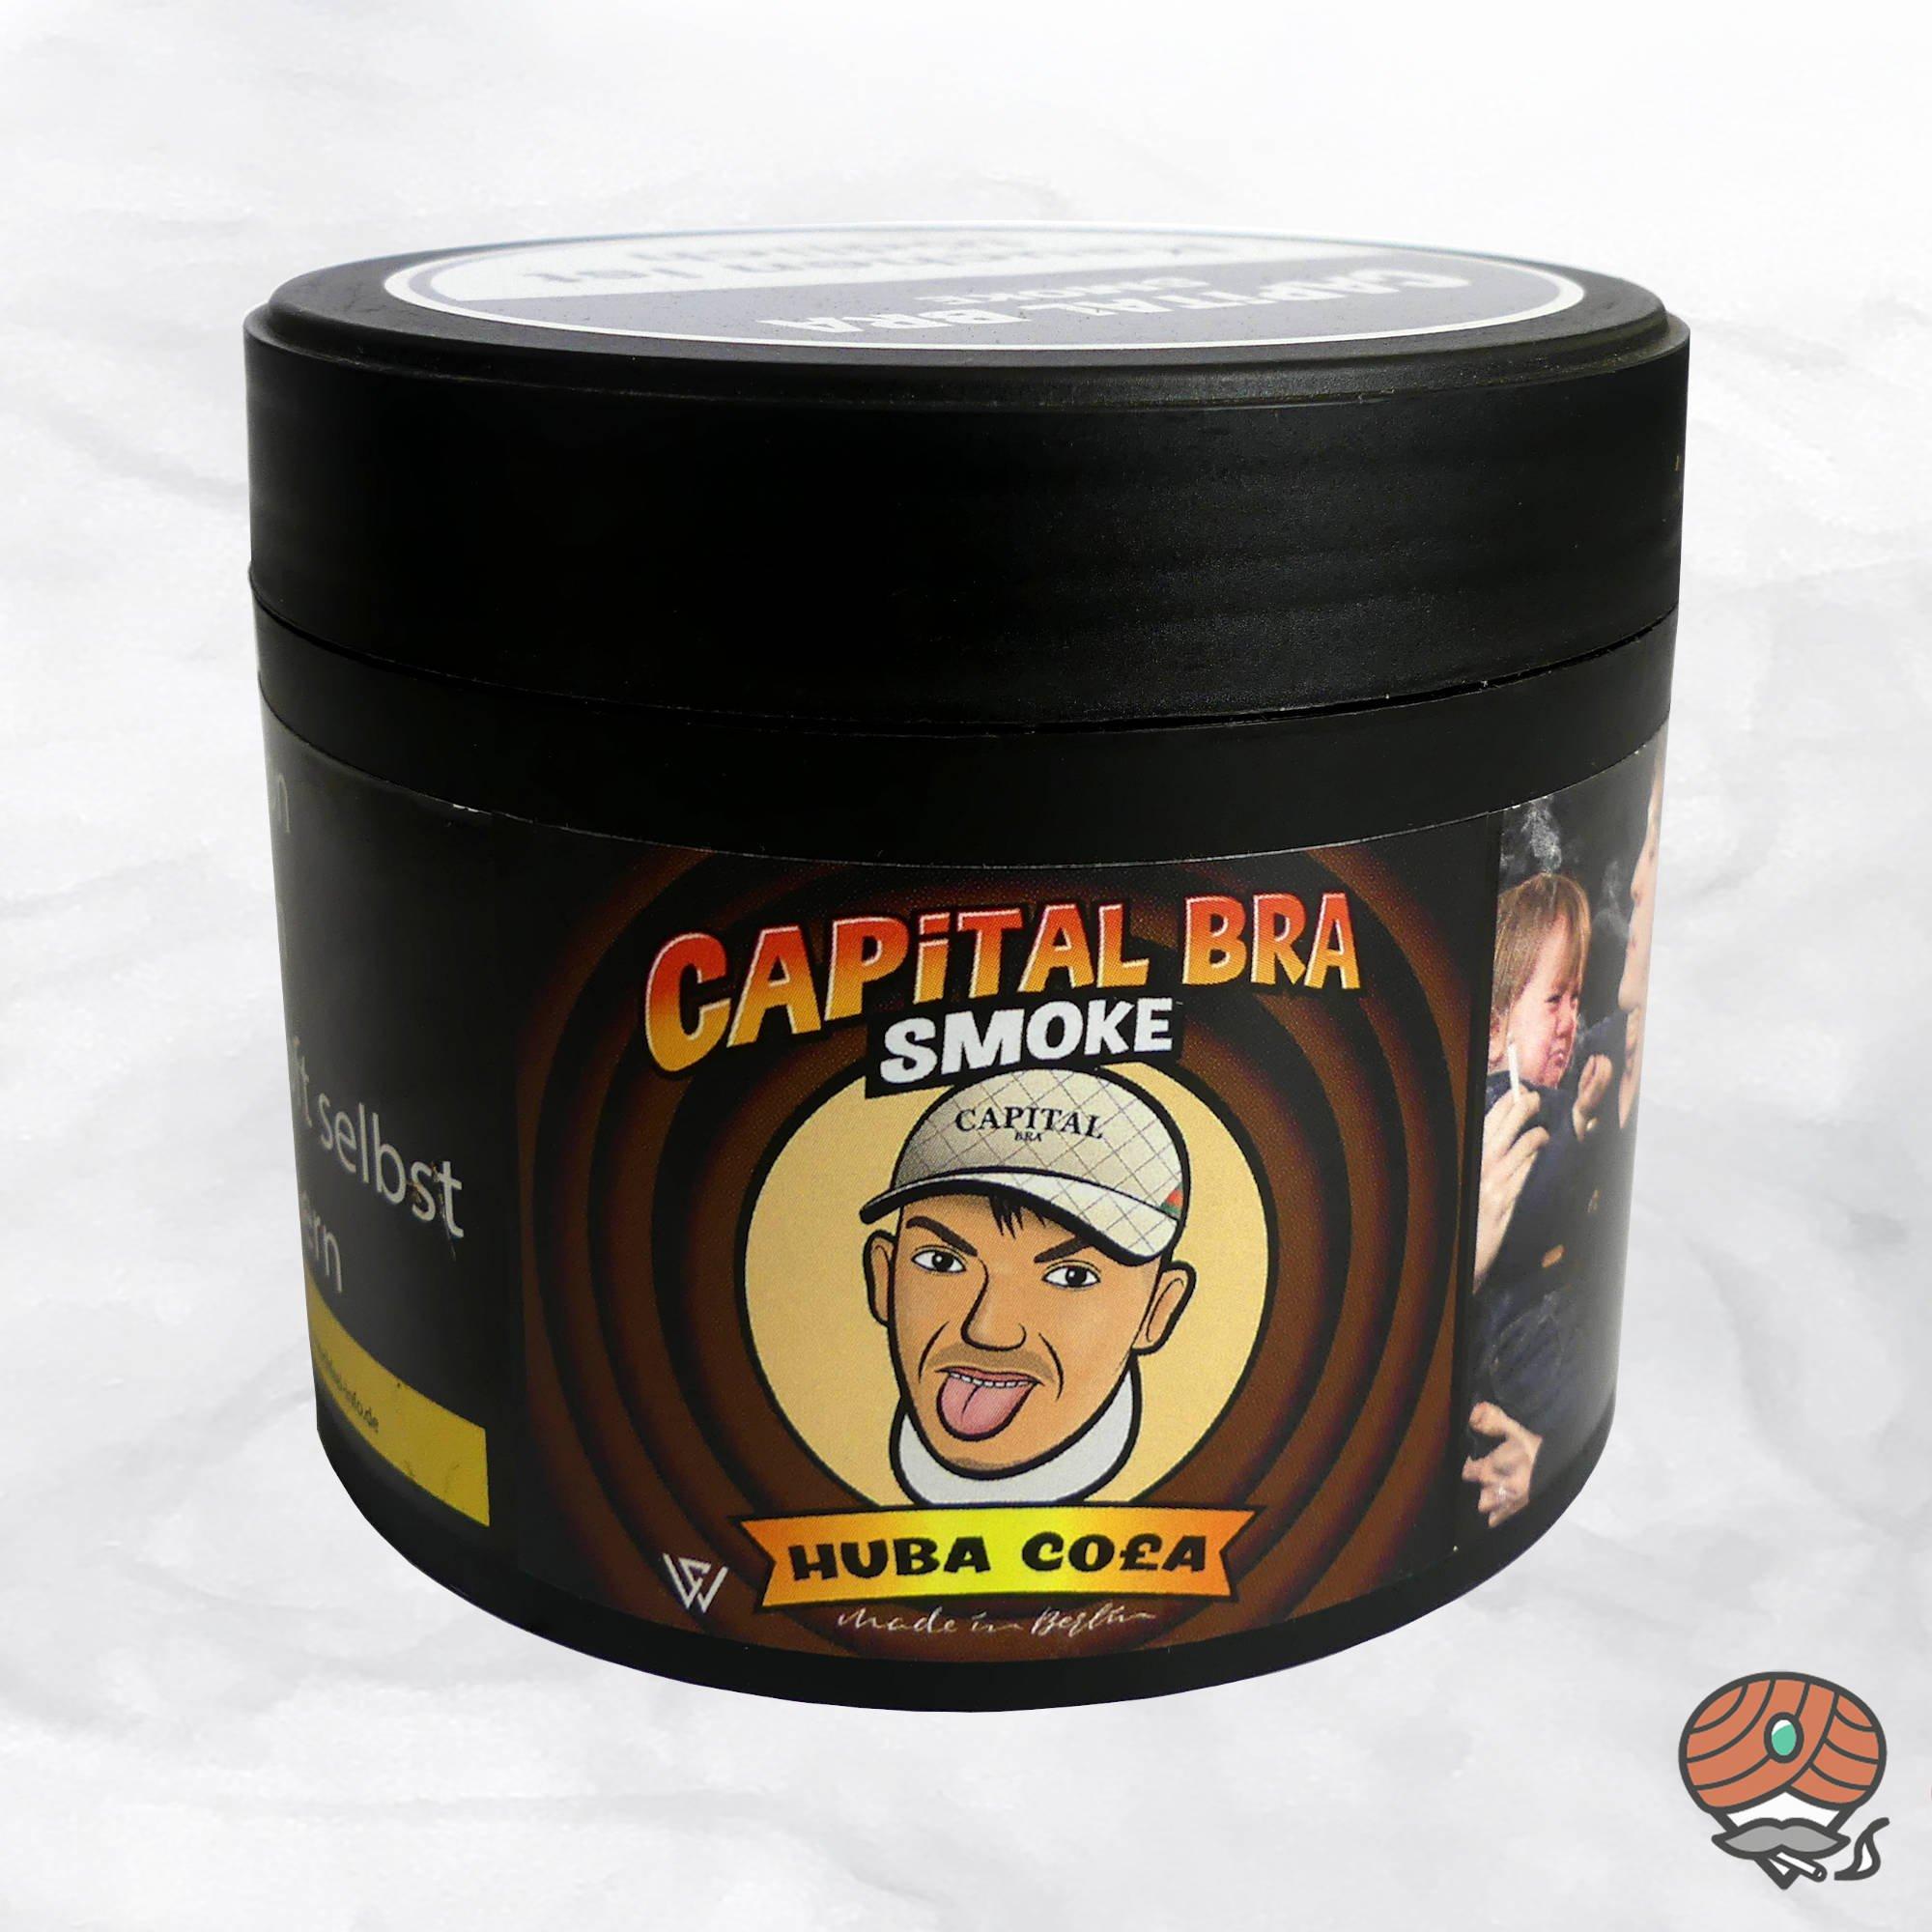 Capital Bra Smoke Shisha Tabak - Huba Cola 200g